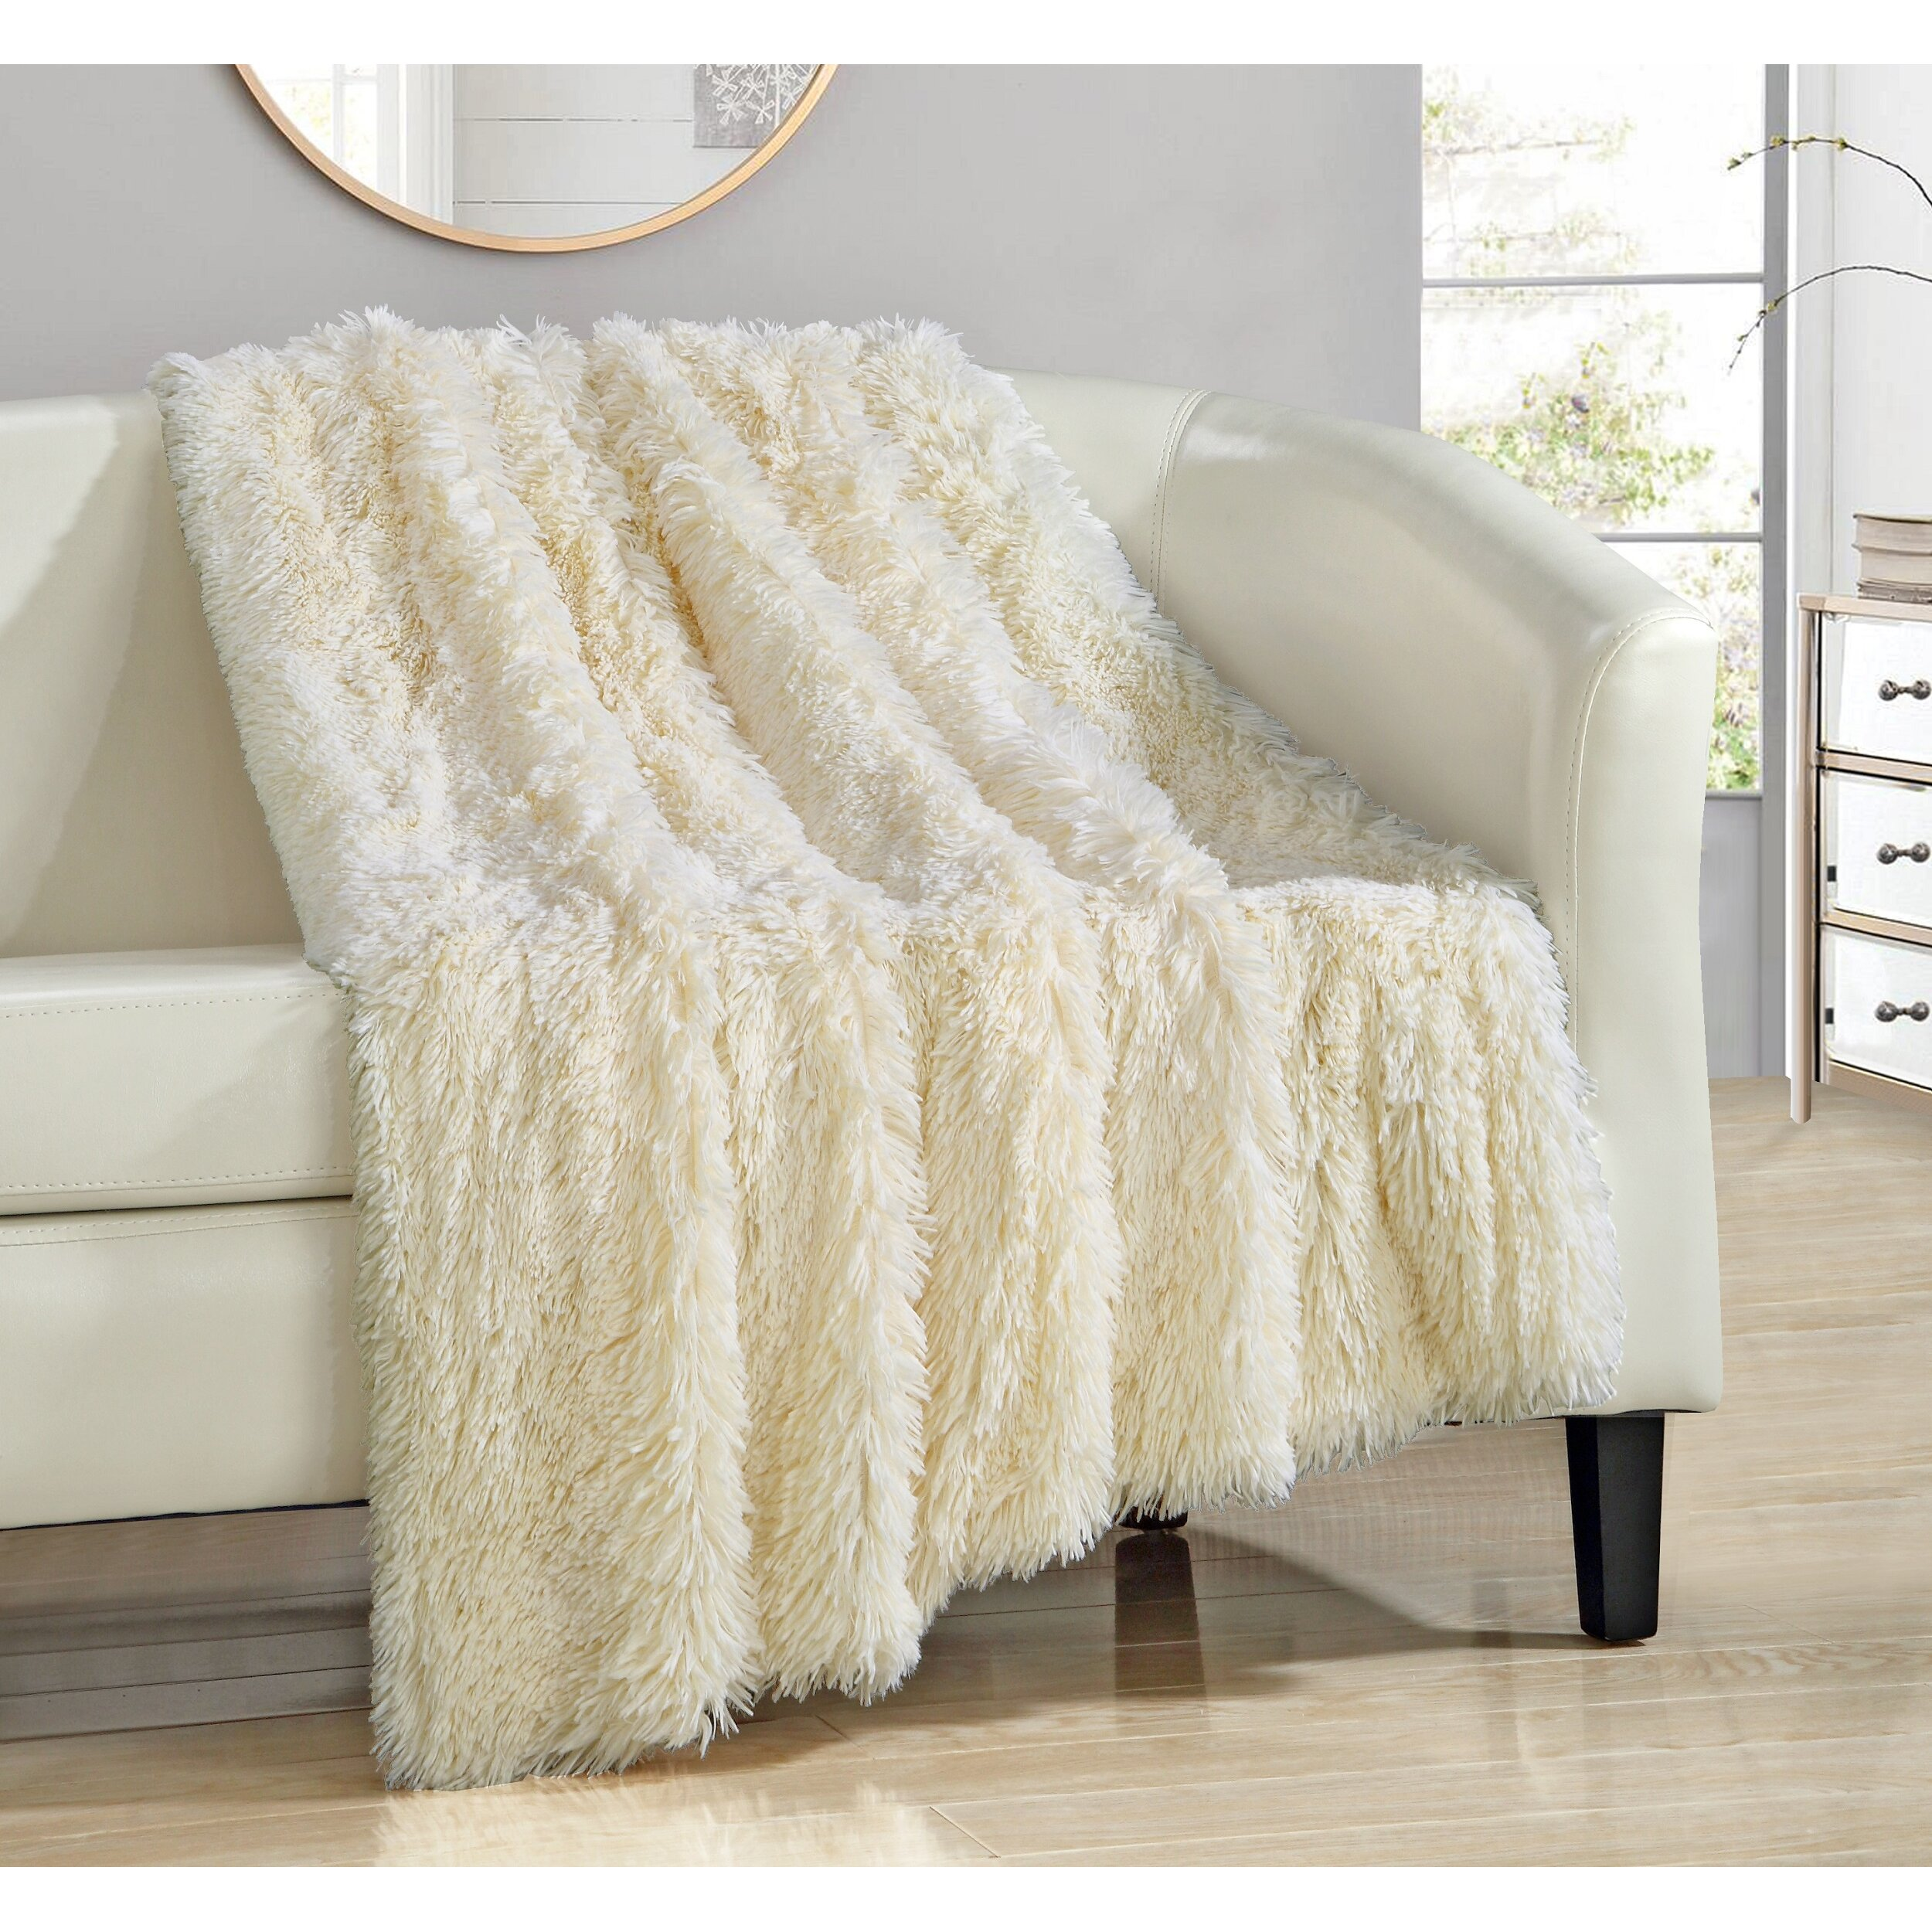 chic home elana shaggy faux fur supersoft ultra plush decorative throw blanket reviews wayfair. Black Bedroom Furniture Sets. Home Design Ideas